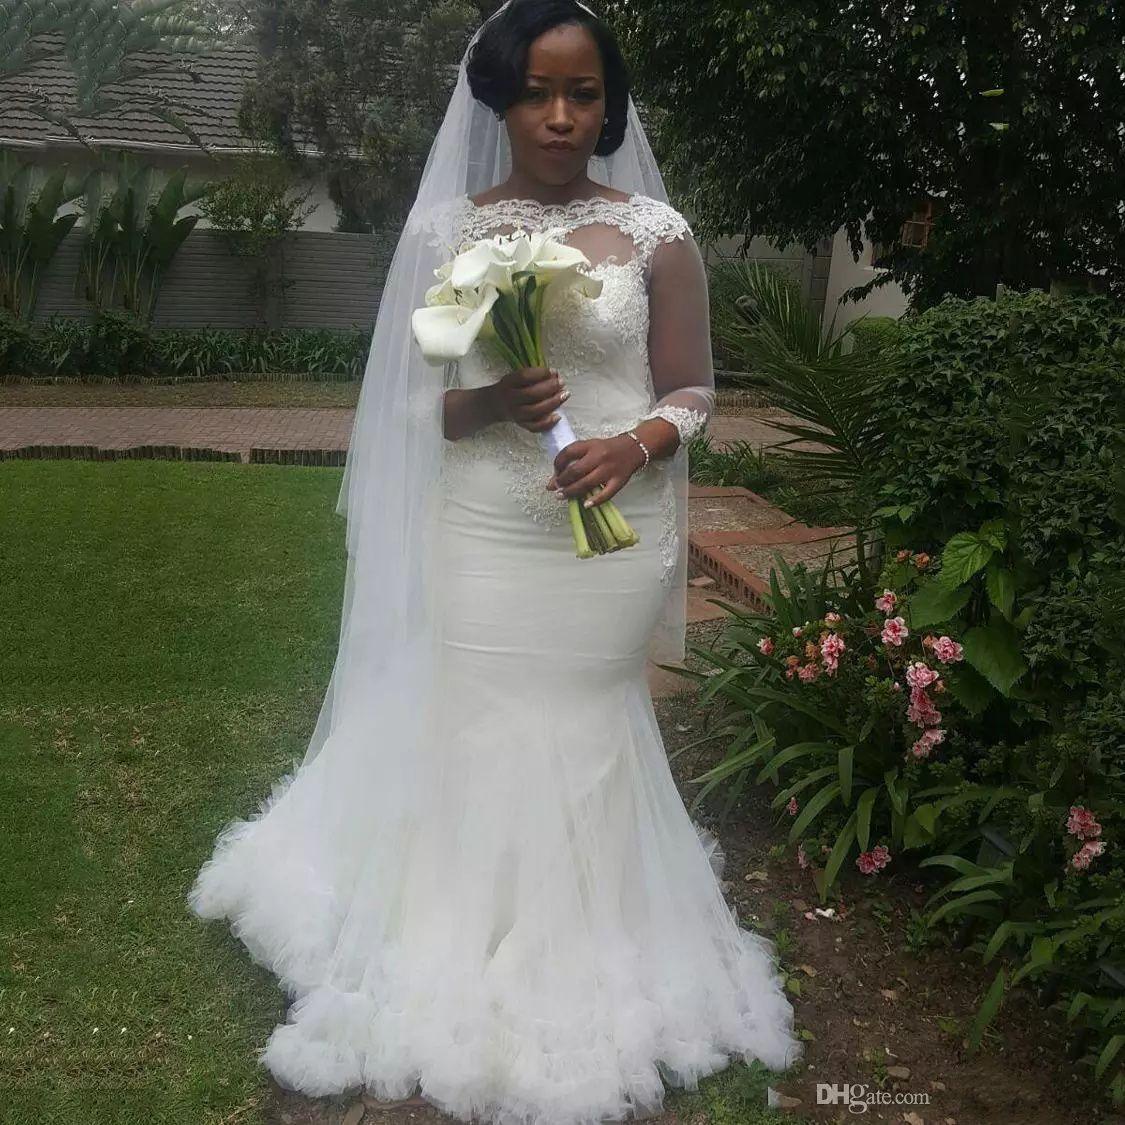 Abiti da sposa Sirena sudafricana Abiti da sposa Bateau Pizzo 3/4 maniche lunghe Plus Size Abiti da sposa Back Zipper Sweep Train Made Abiti da sposa